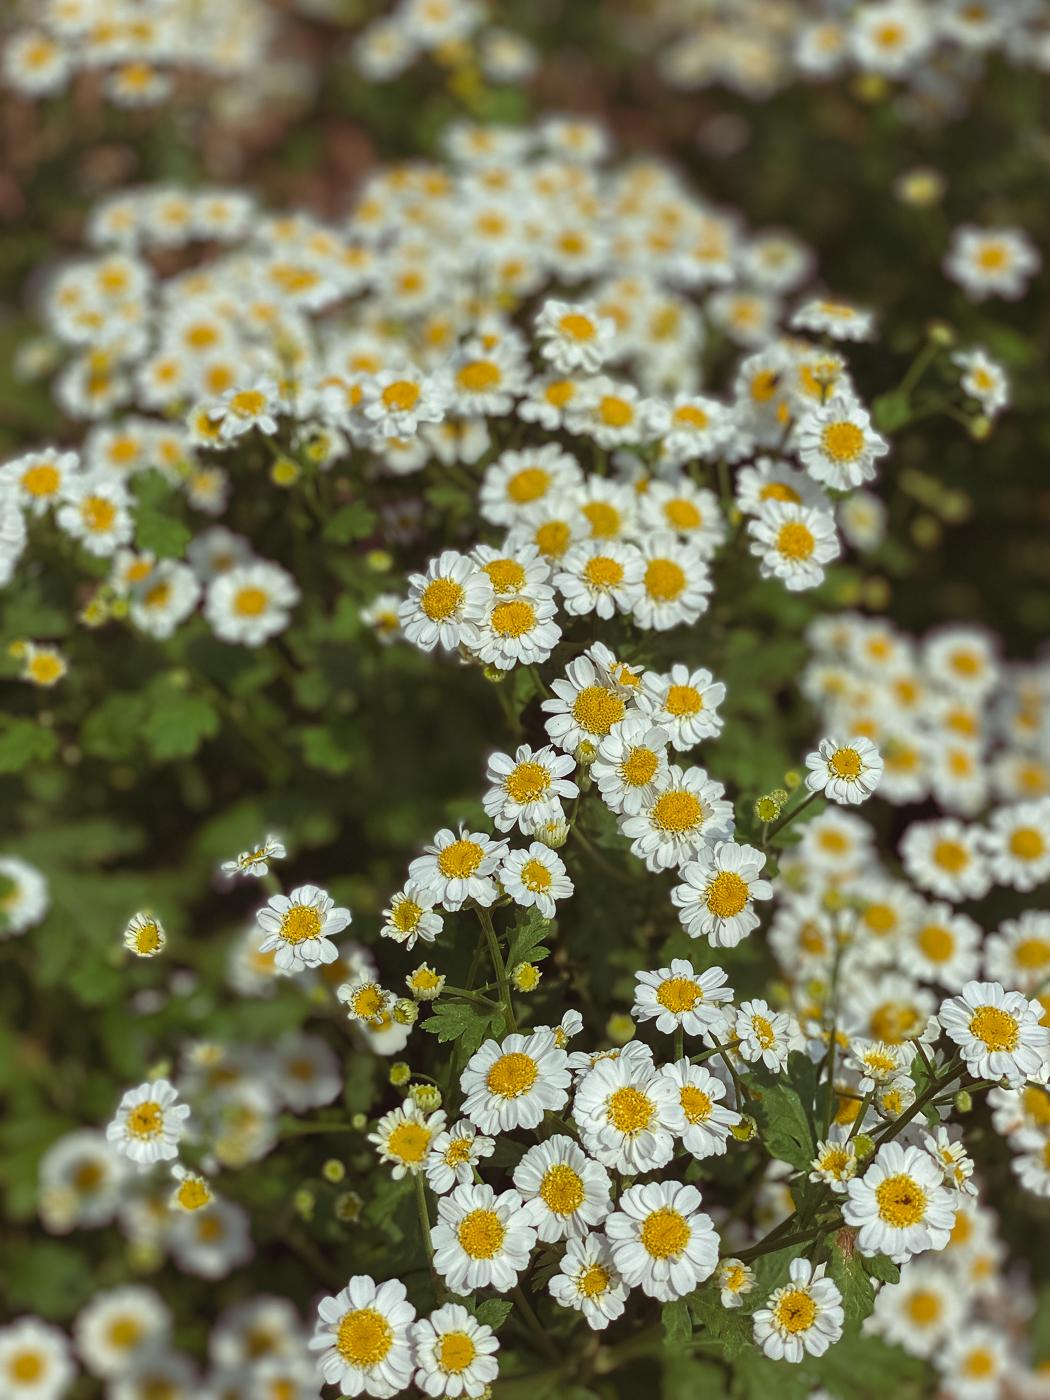 feverfew, summer garden flowers, blooming flowers, summer flowers that bloom